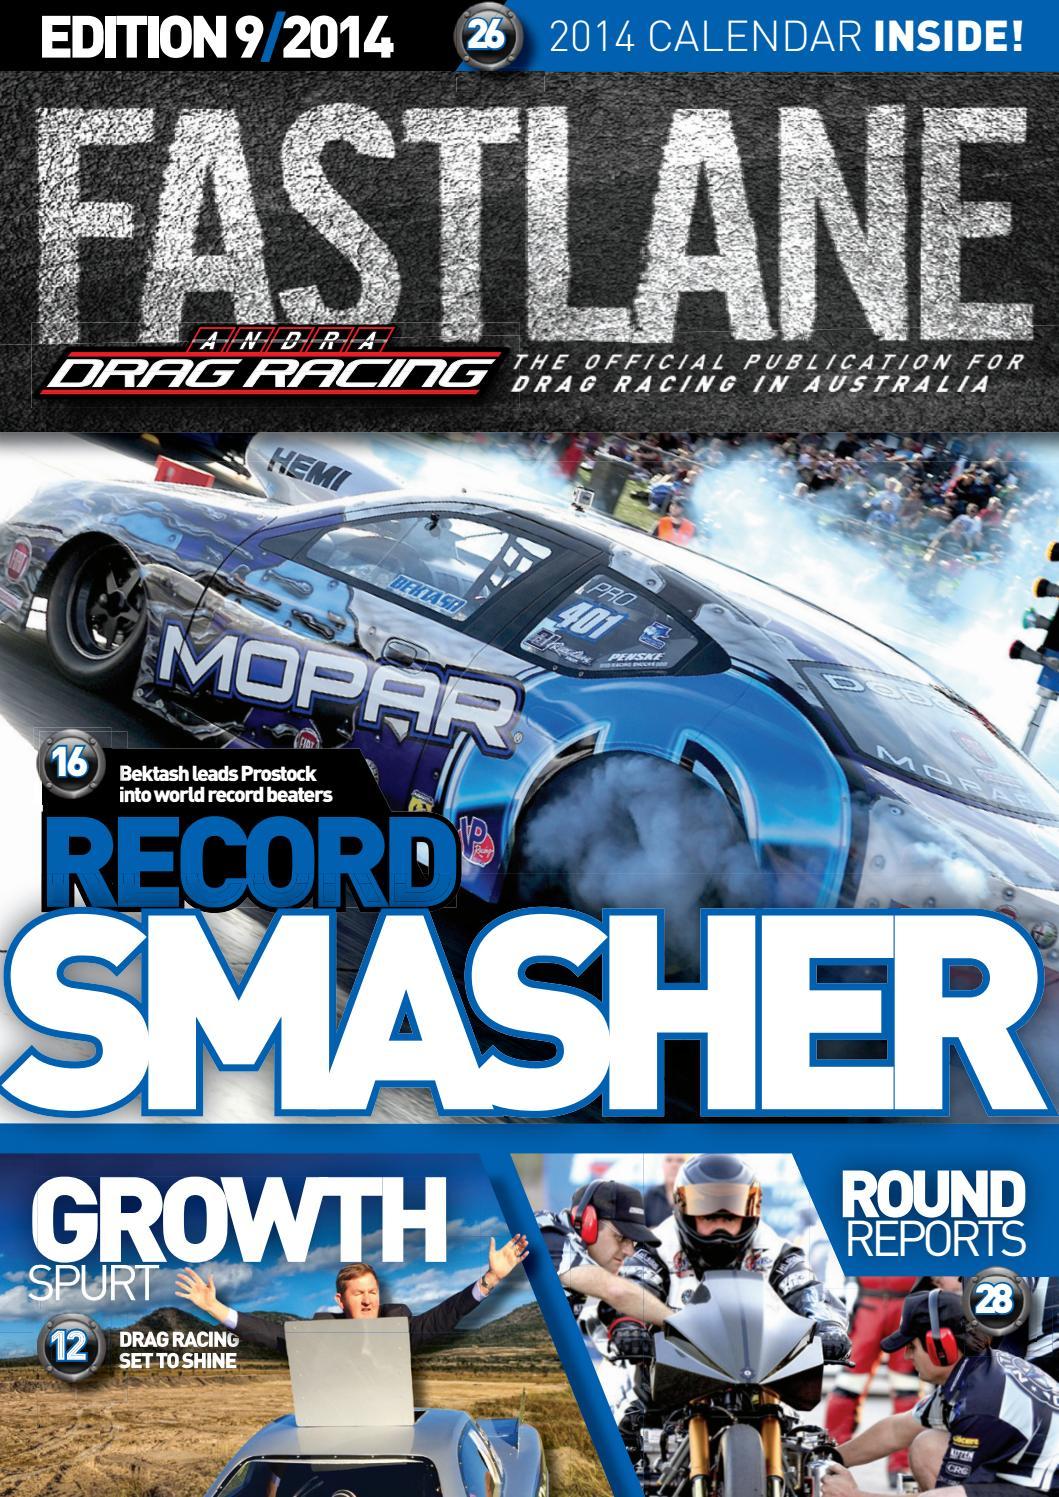 Fastlane Magazine  Issue 9 By Andra Drag Racing  Issuu regarding Benaraby Raceway Calendar